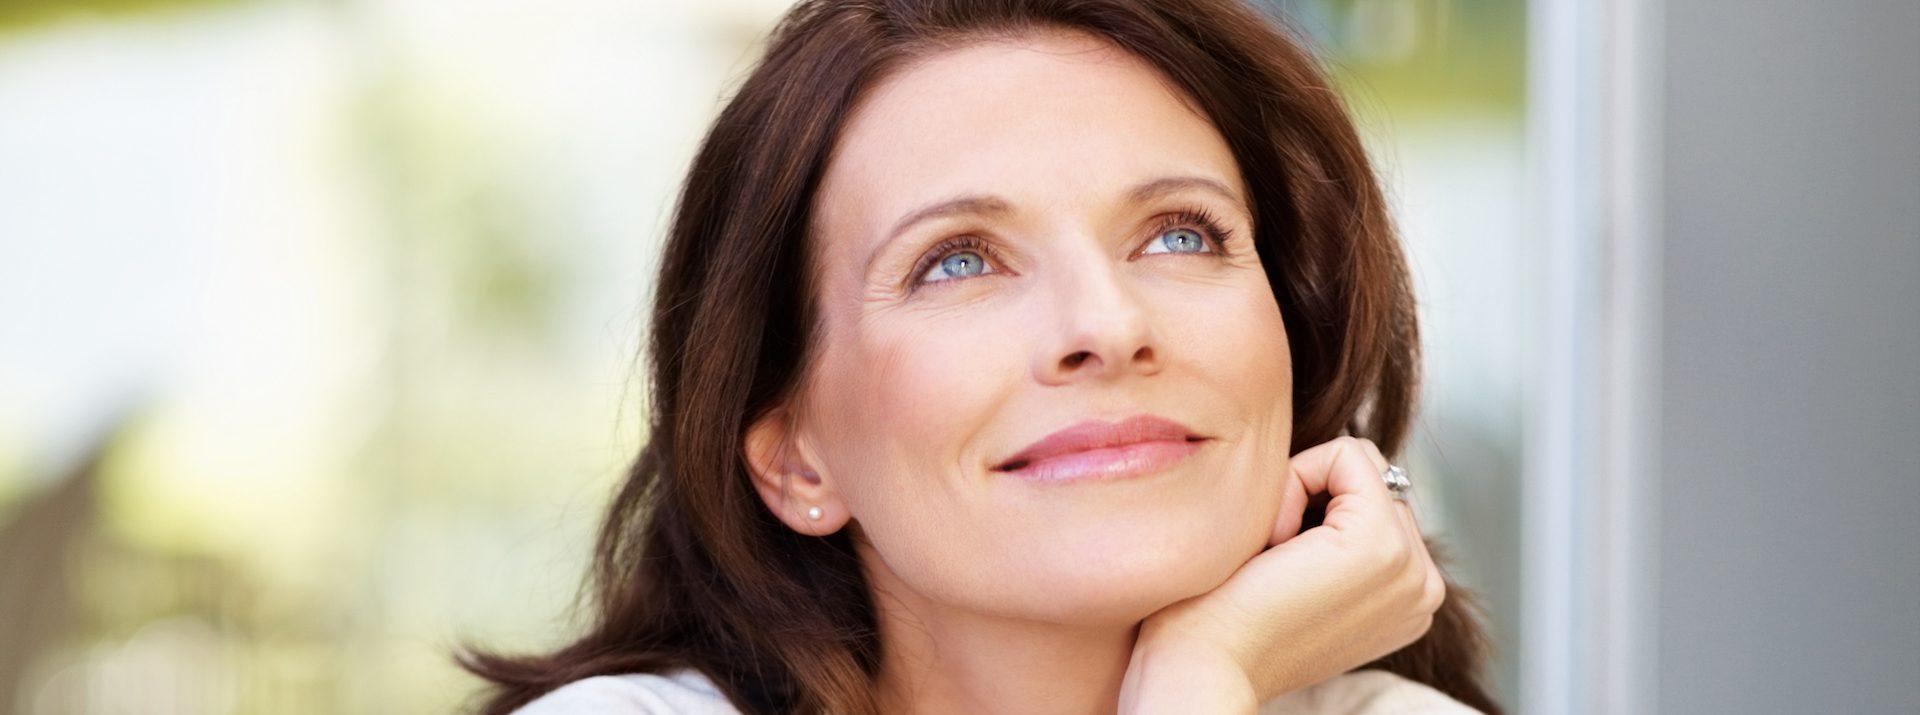 Huidveroudering huidverjonging anti aging Huidtotaal Huidtherapie Arnhem